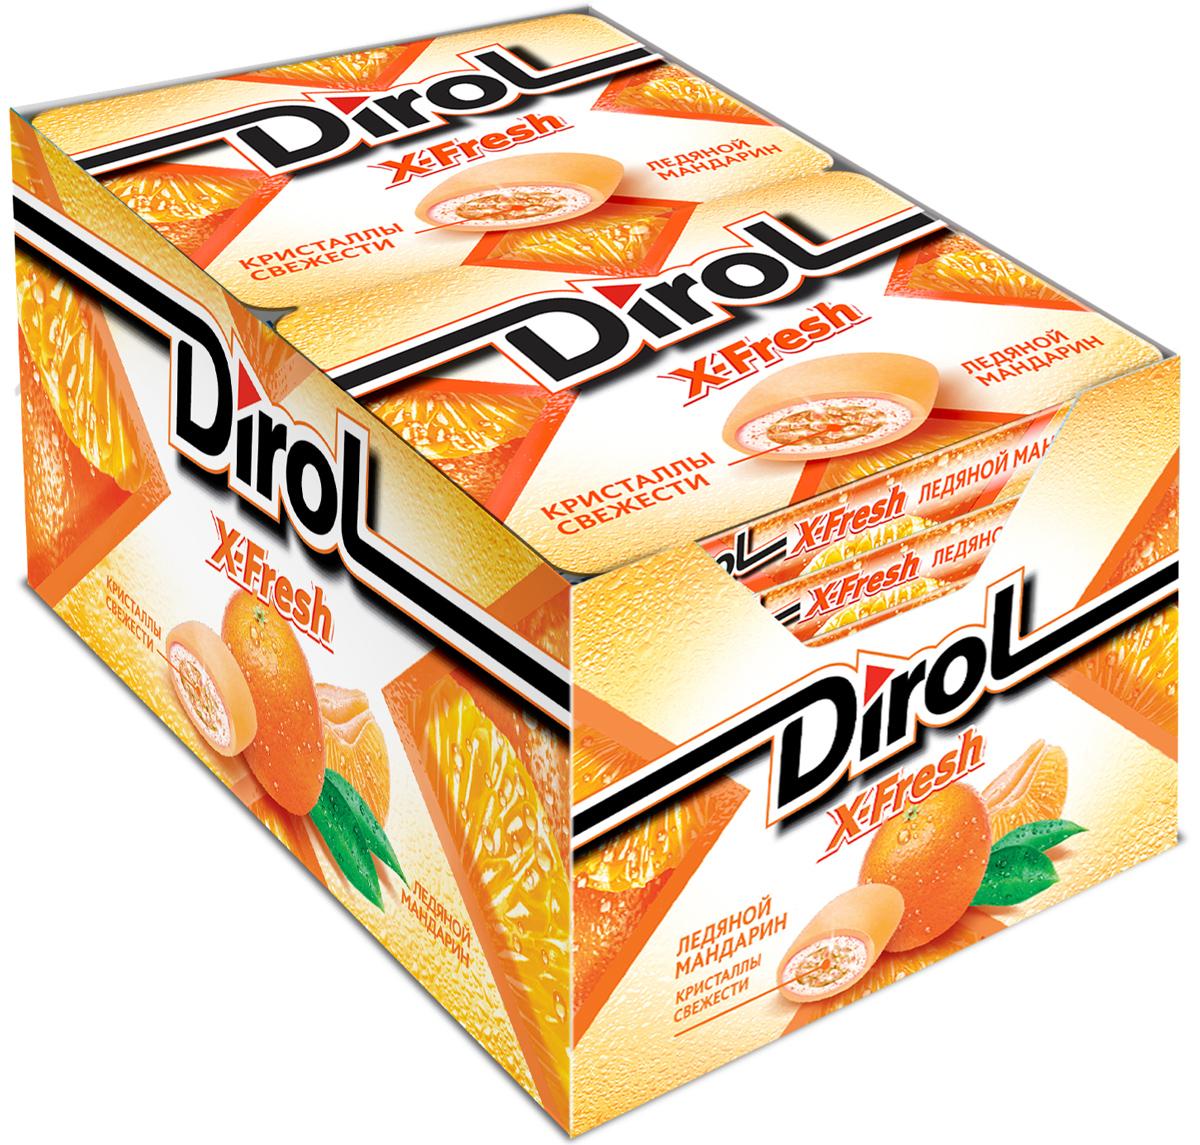 Dirol X-Fresh жевательная резинка без сахара со вкусом мандарина, 12 пачек по 16 г